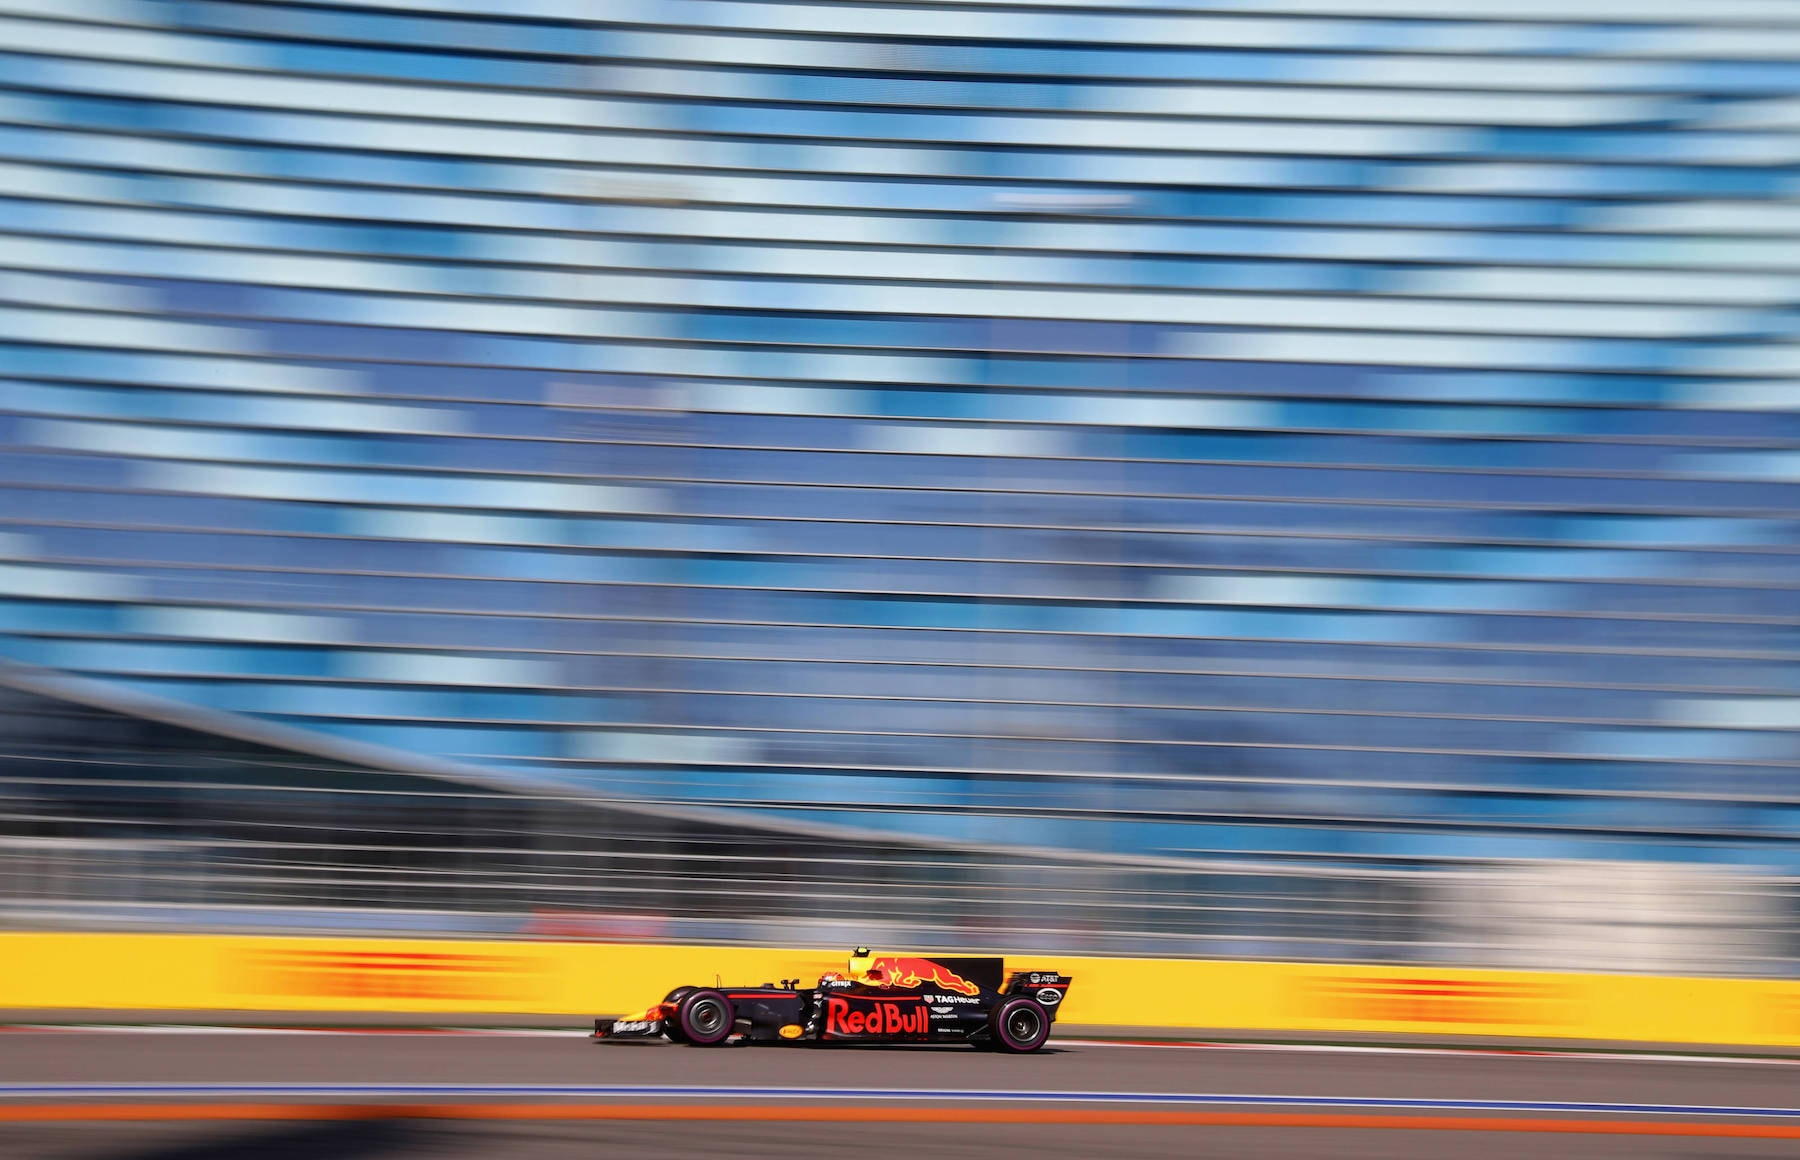 J 2017 Max Verstappen | Red Bull RB13 | 2017 Russian GP P 1 copy.jpg